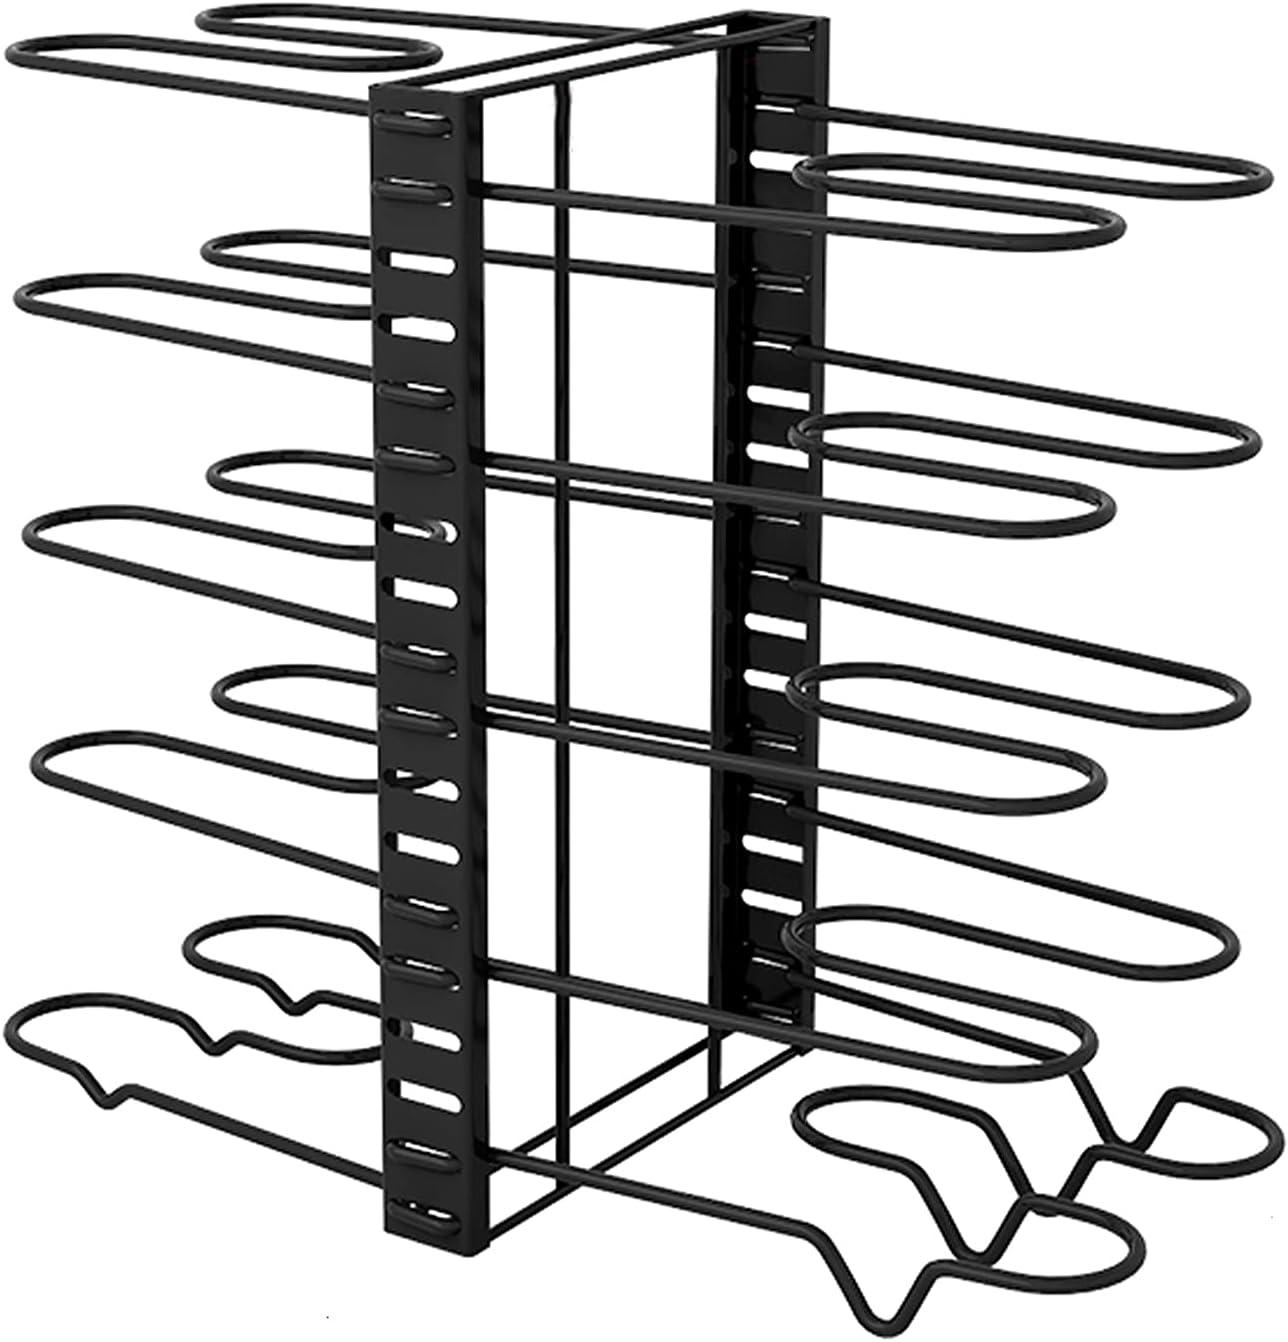 Philadelphia Mall Kitchen Storage Rack Pot Shelves a At the price for Pots